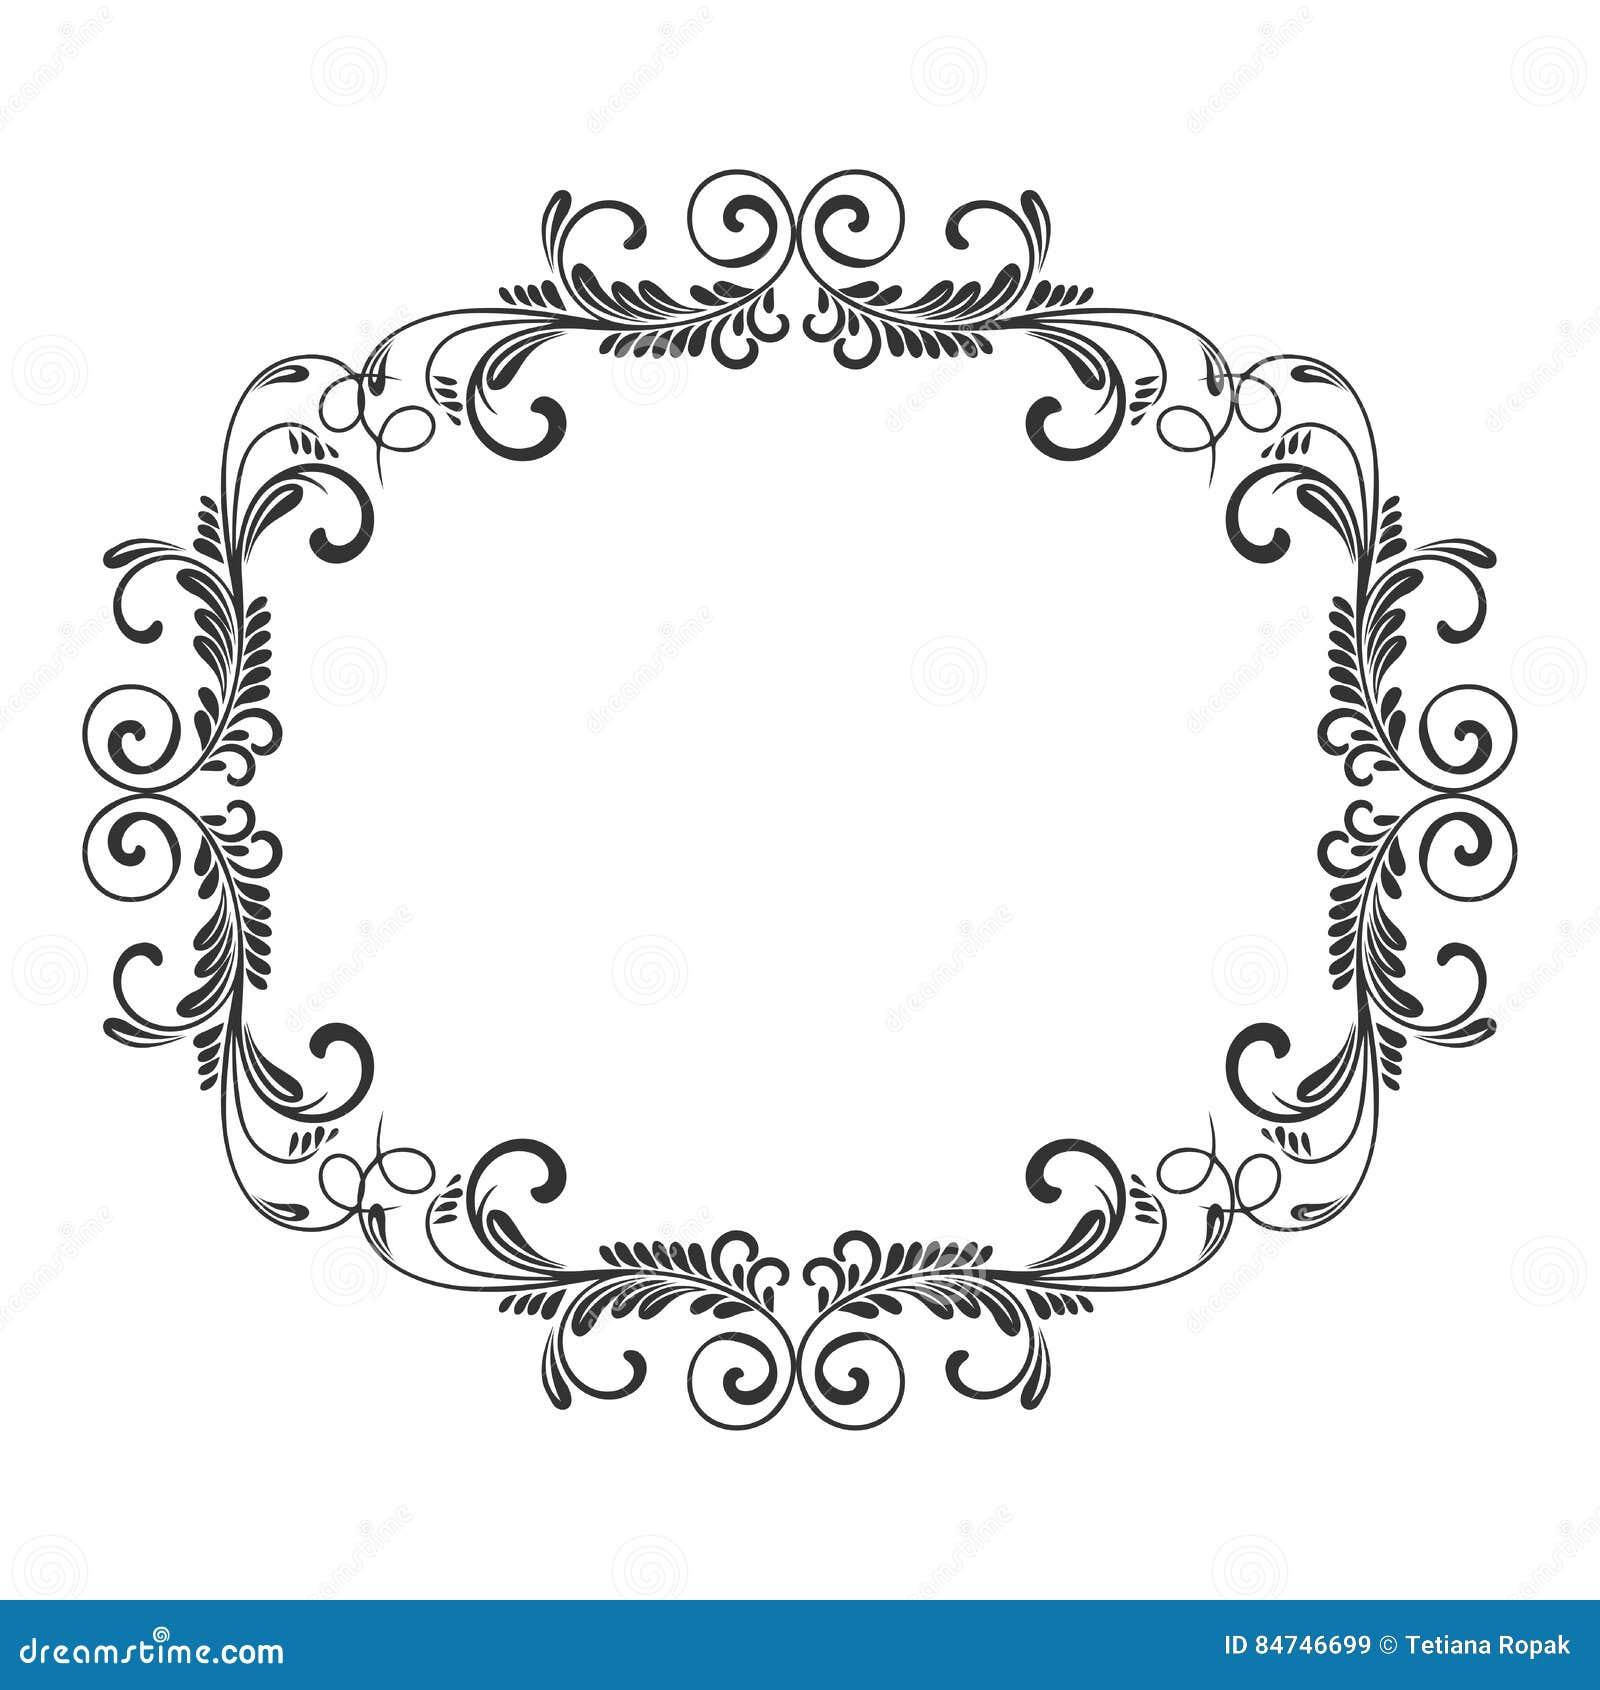 3d Sehr Schöne Dreidimensionale Abbildung, Abbildung Kreisförmiges ...